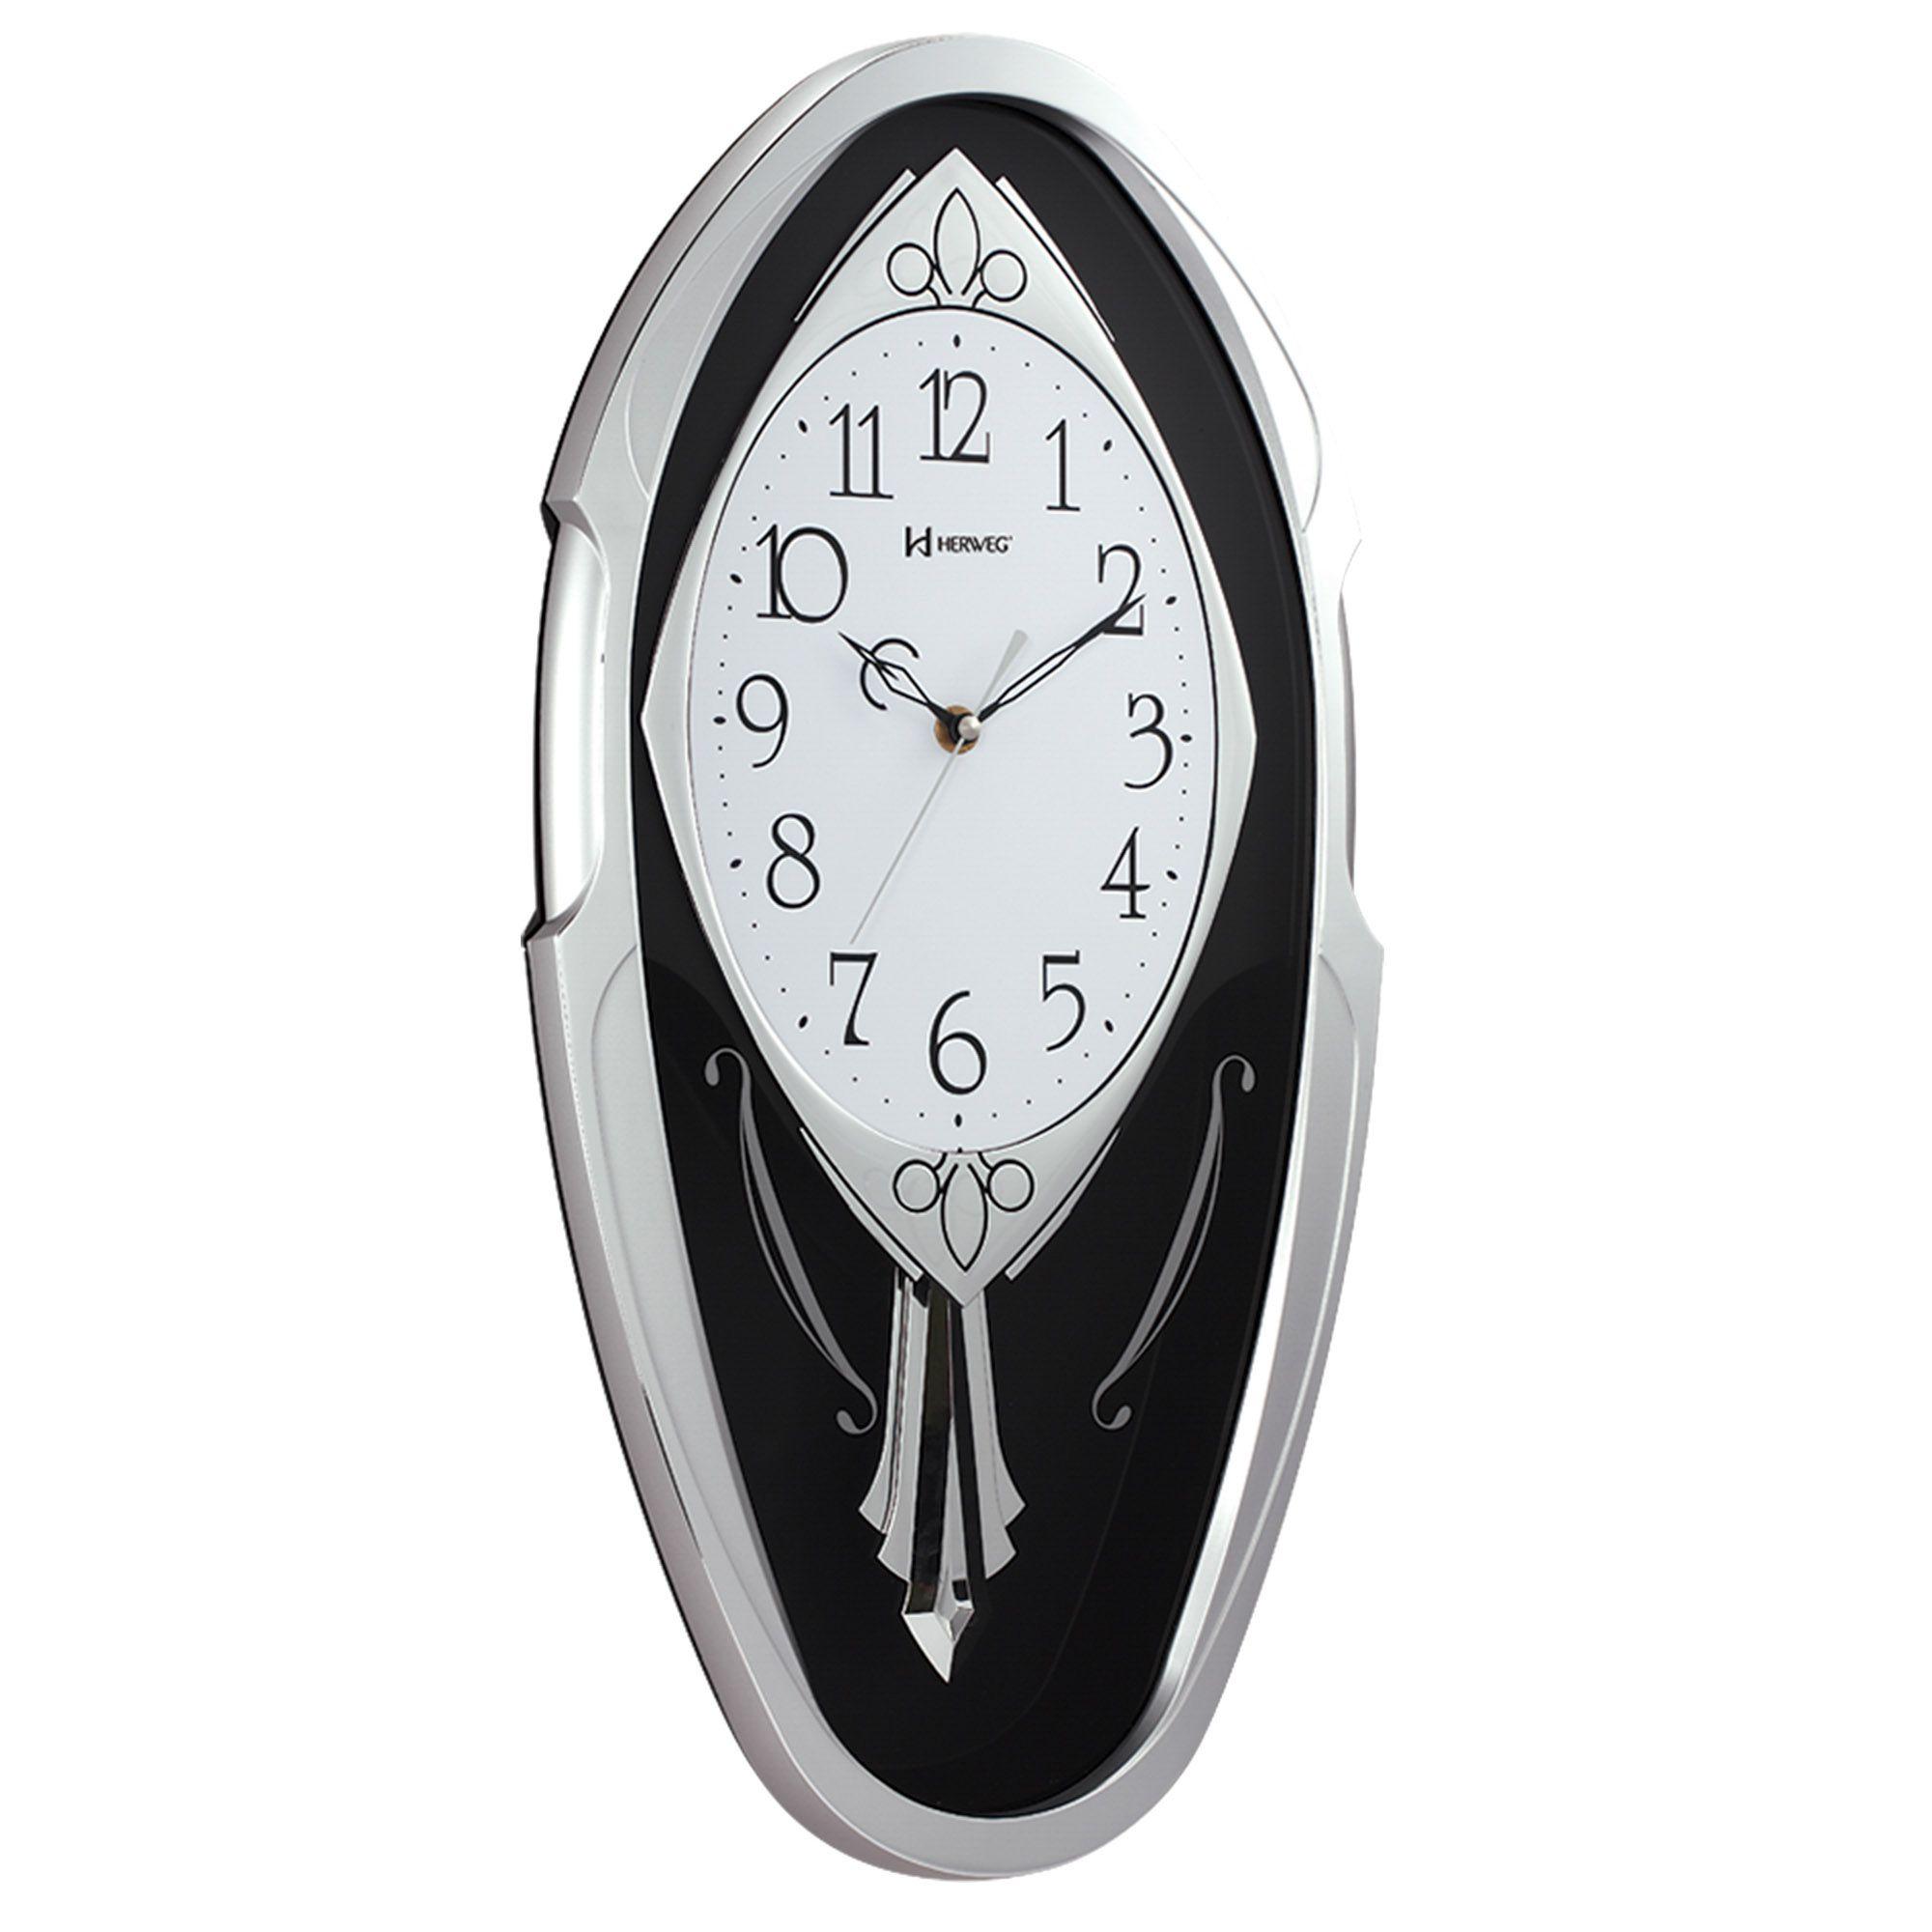 Relógio de Parede Pêndulo Herweg 6389 070 Prata Metálico